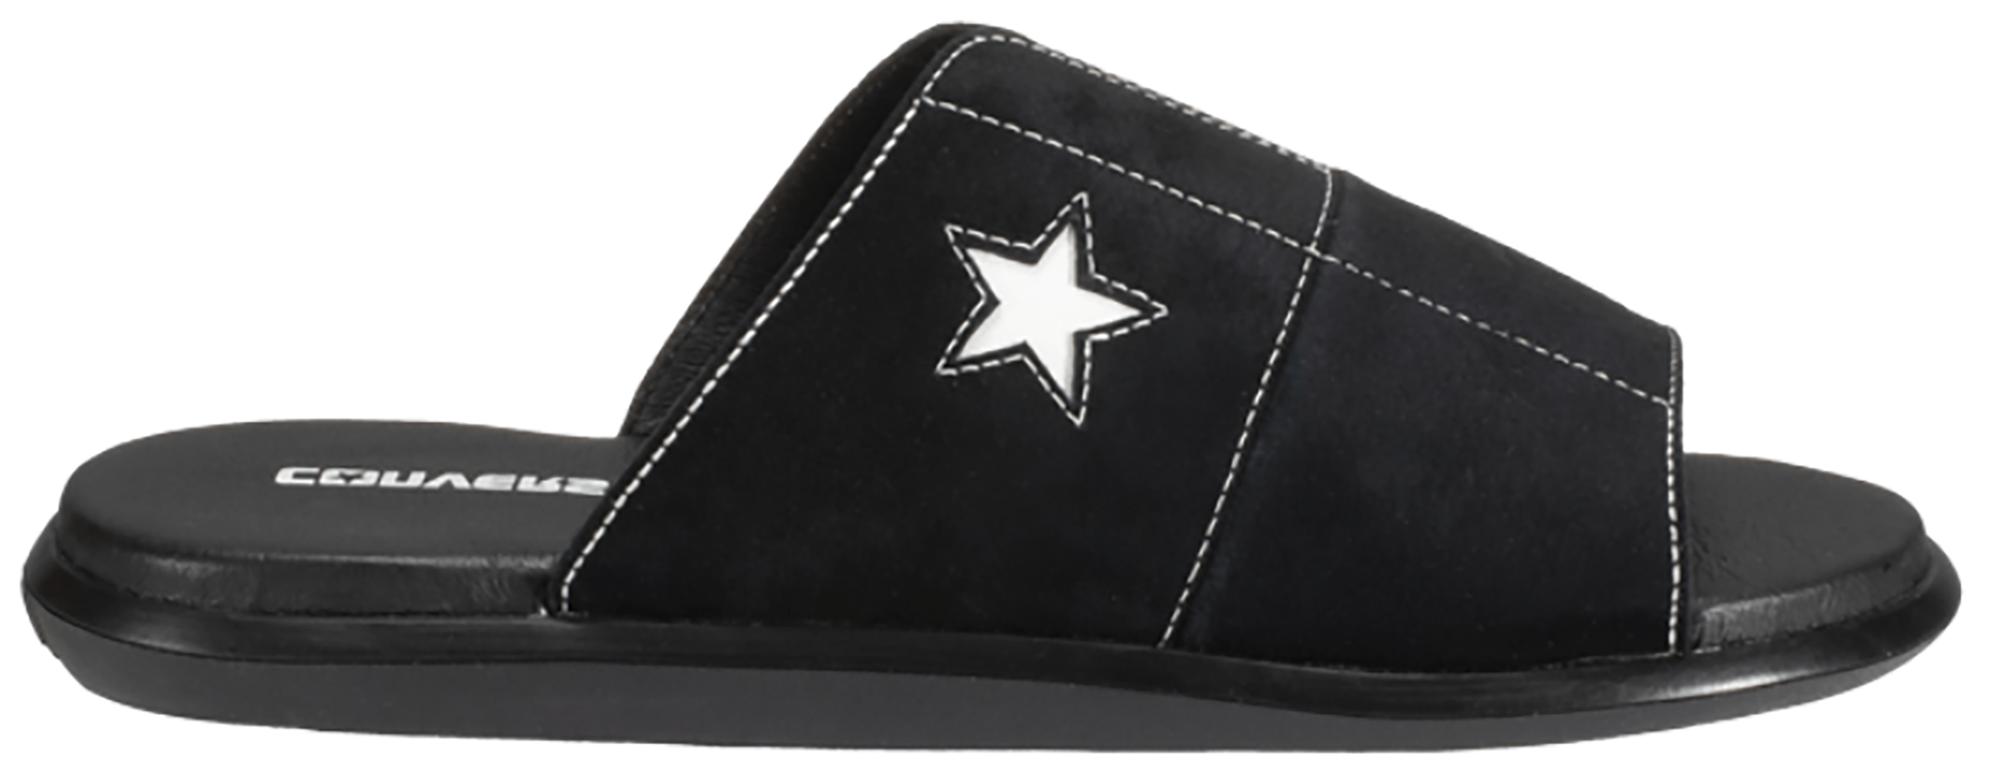 Converse One Star Sandal Addict Black